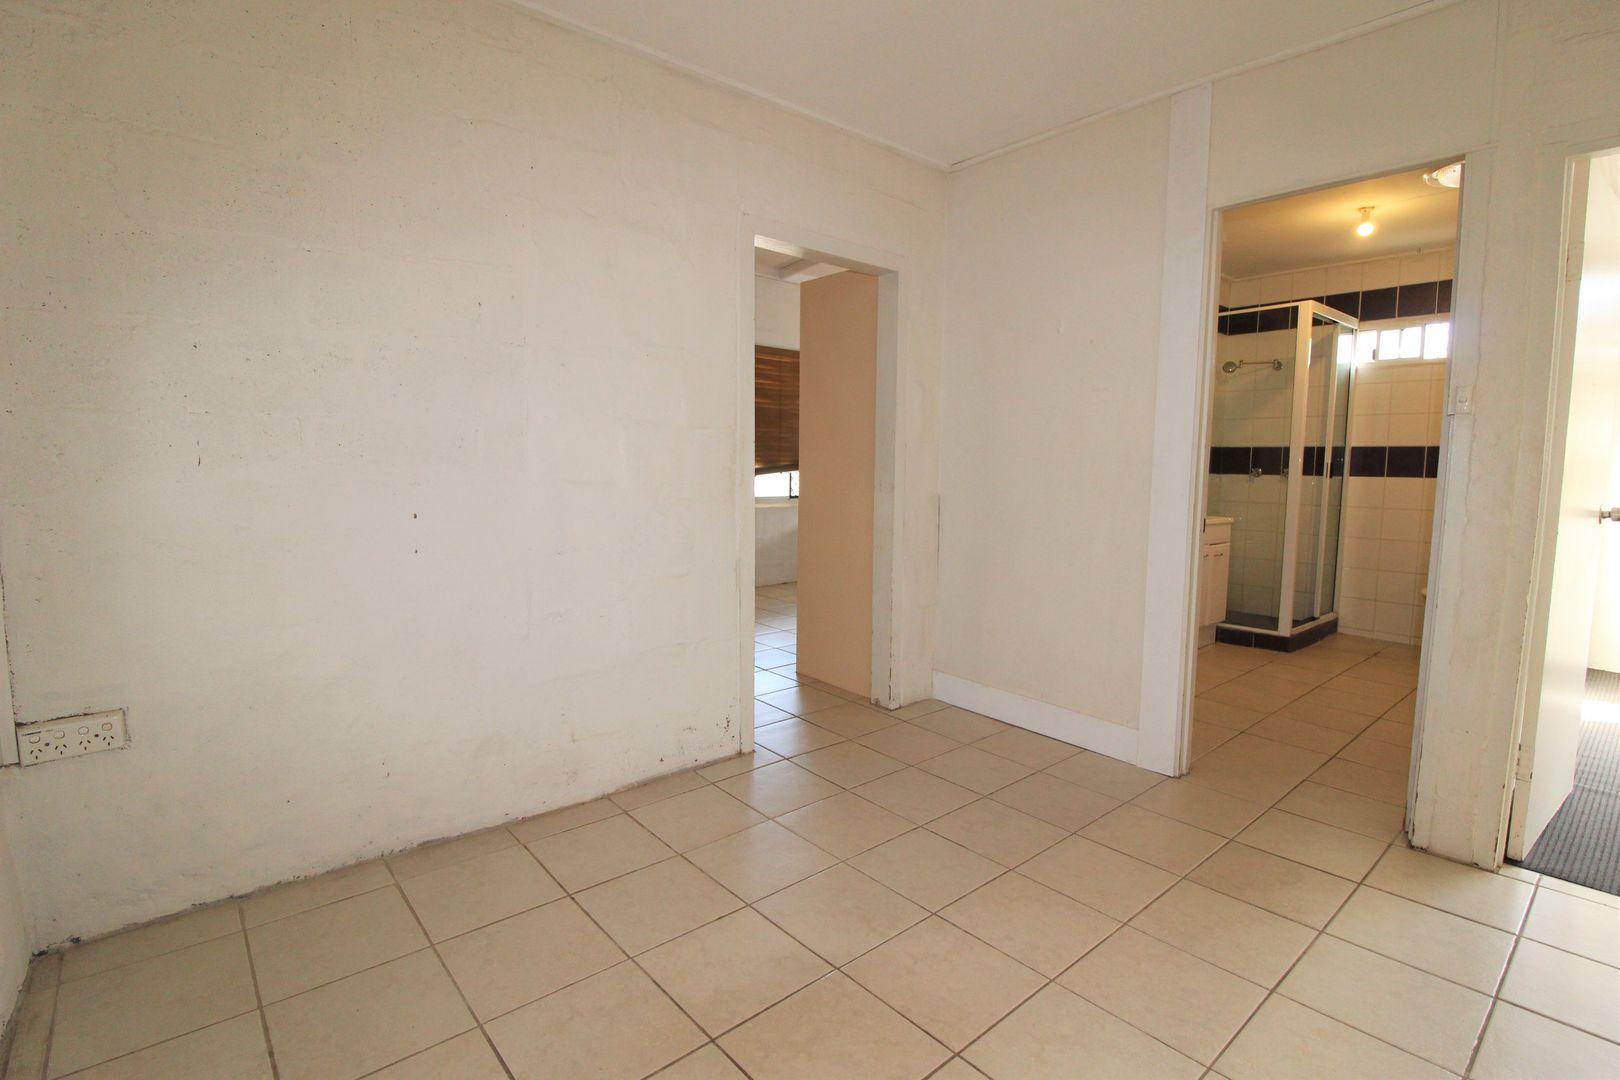 94 Simpson St, Mount Isa QLD 4825, Image 2